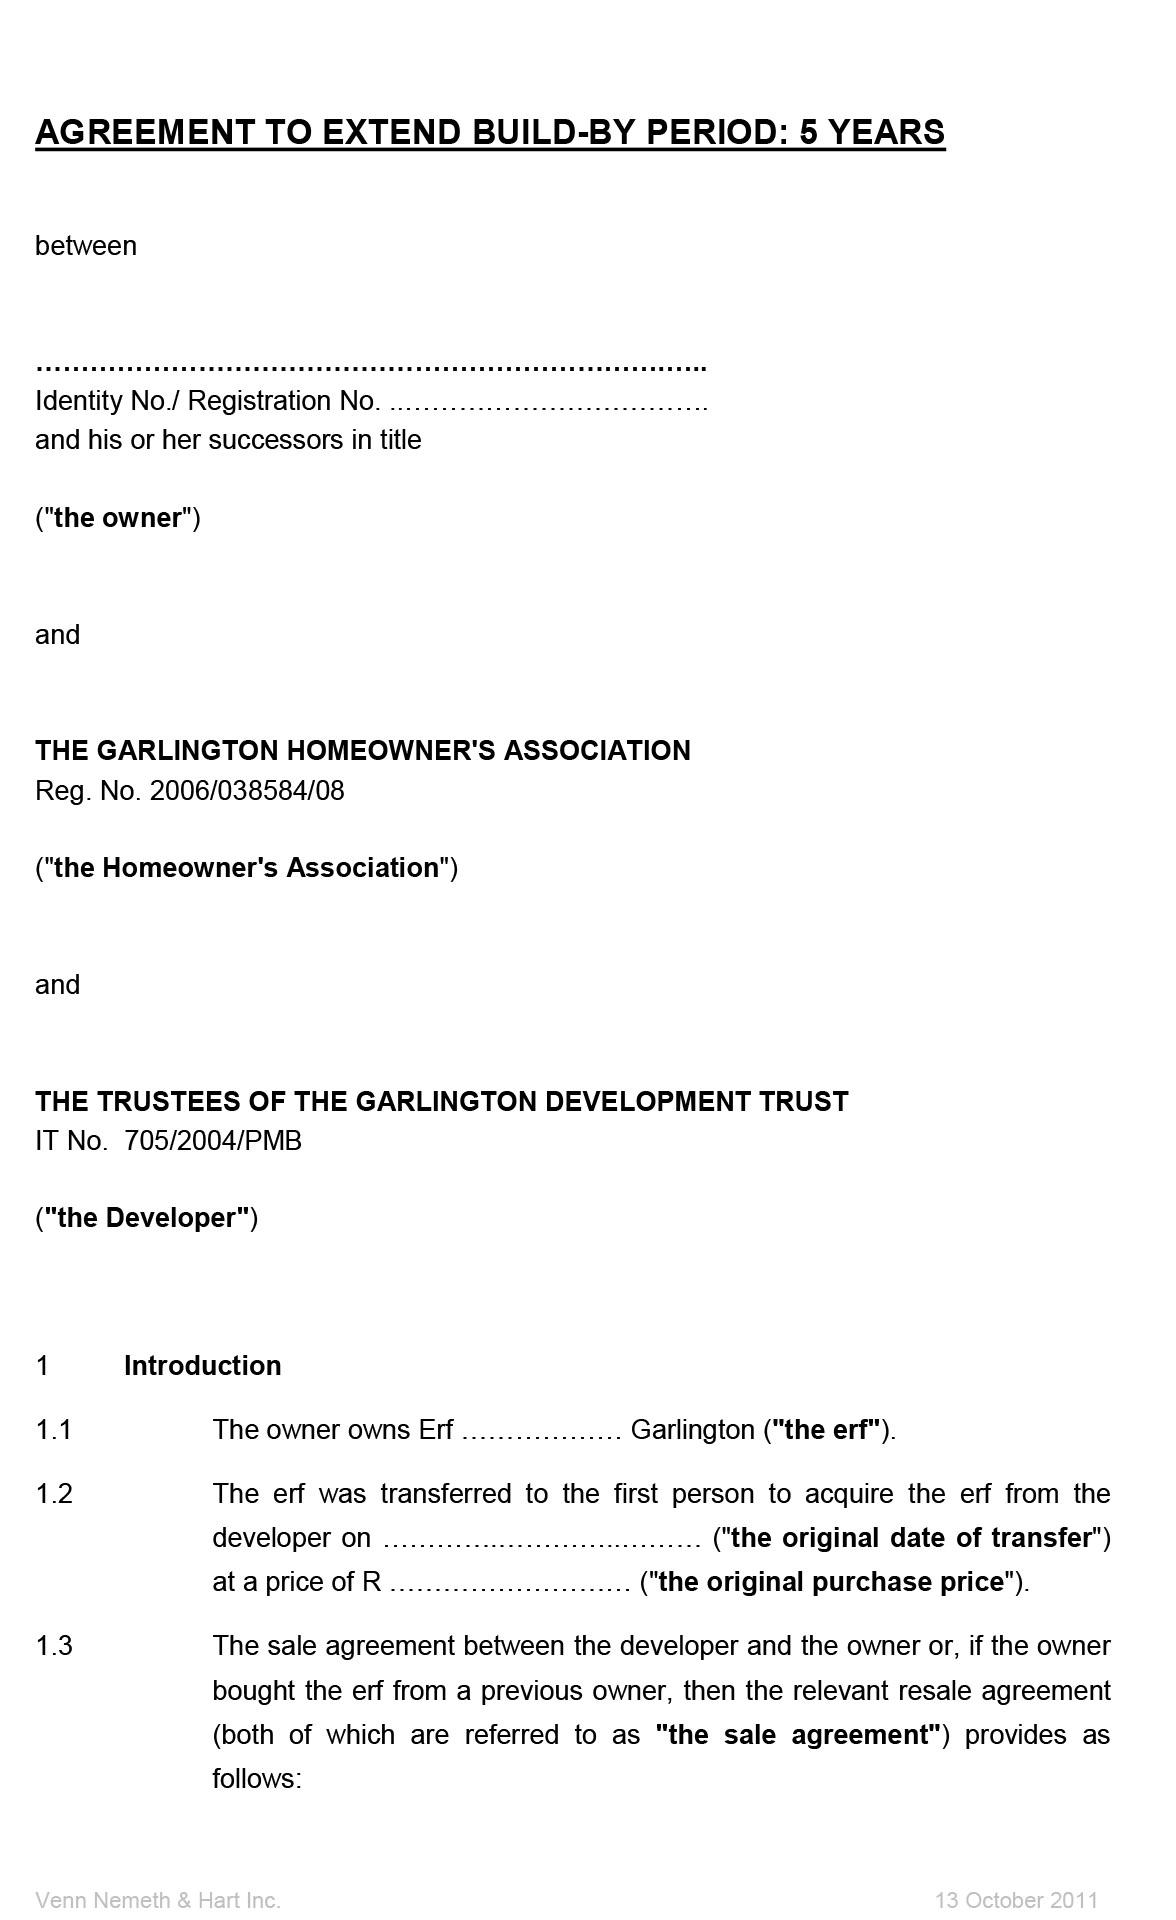 garlington_penality agr_five years_01